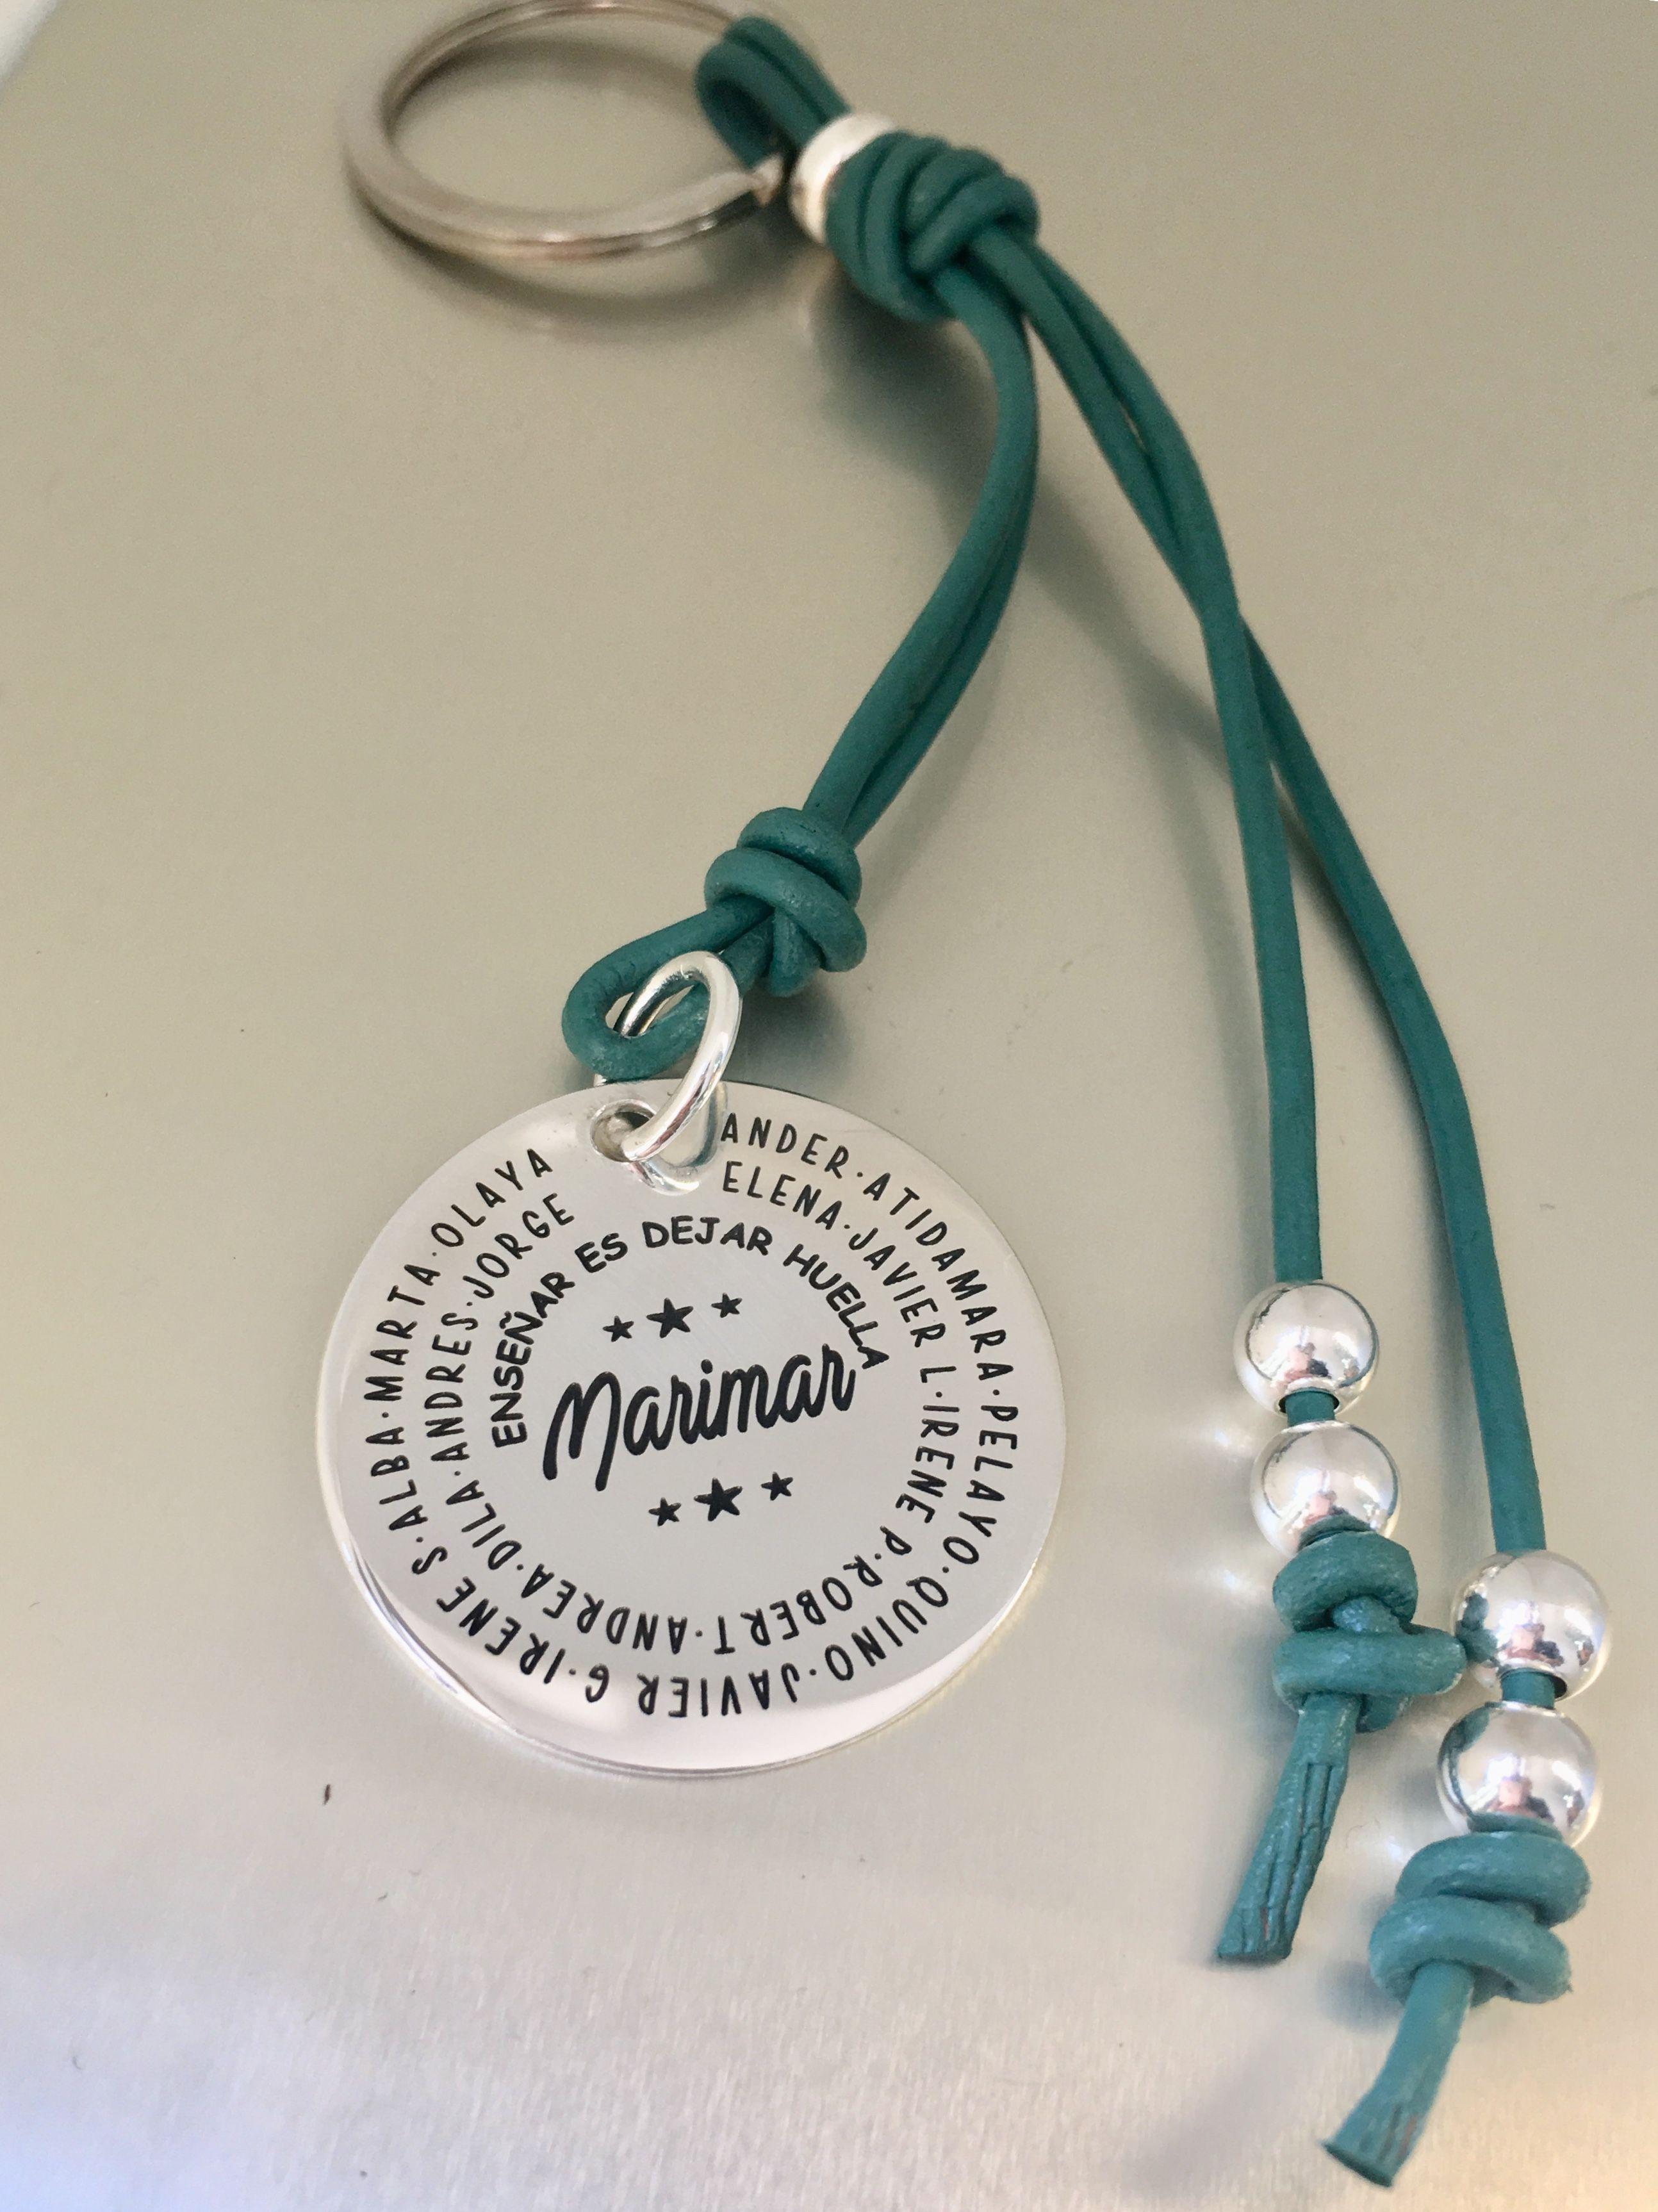 c0beae7291db Medalla grabada personalizada. Especial regalo para profesora en fin de  curso. Joyas que hablan de ti.  miplatafina